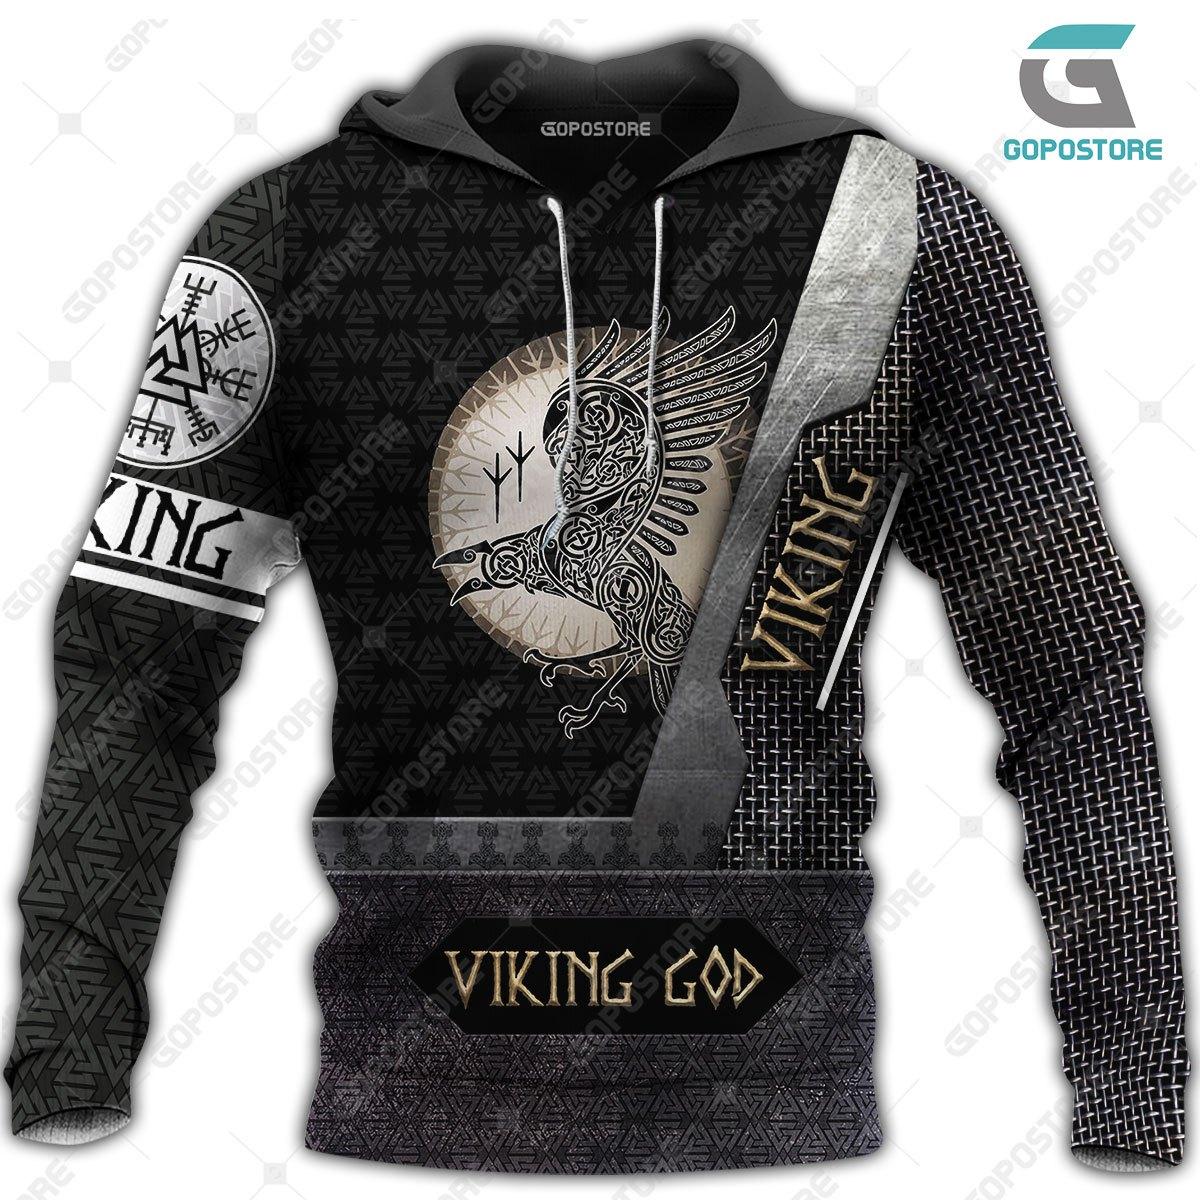 Viking god huginn and muninn full printing hoodie